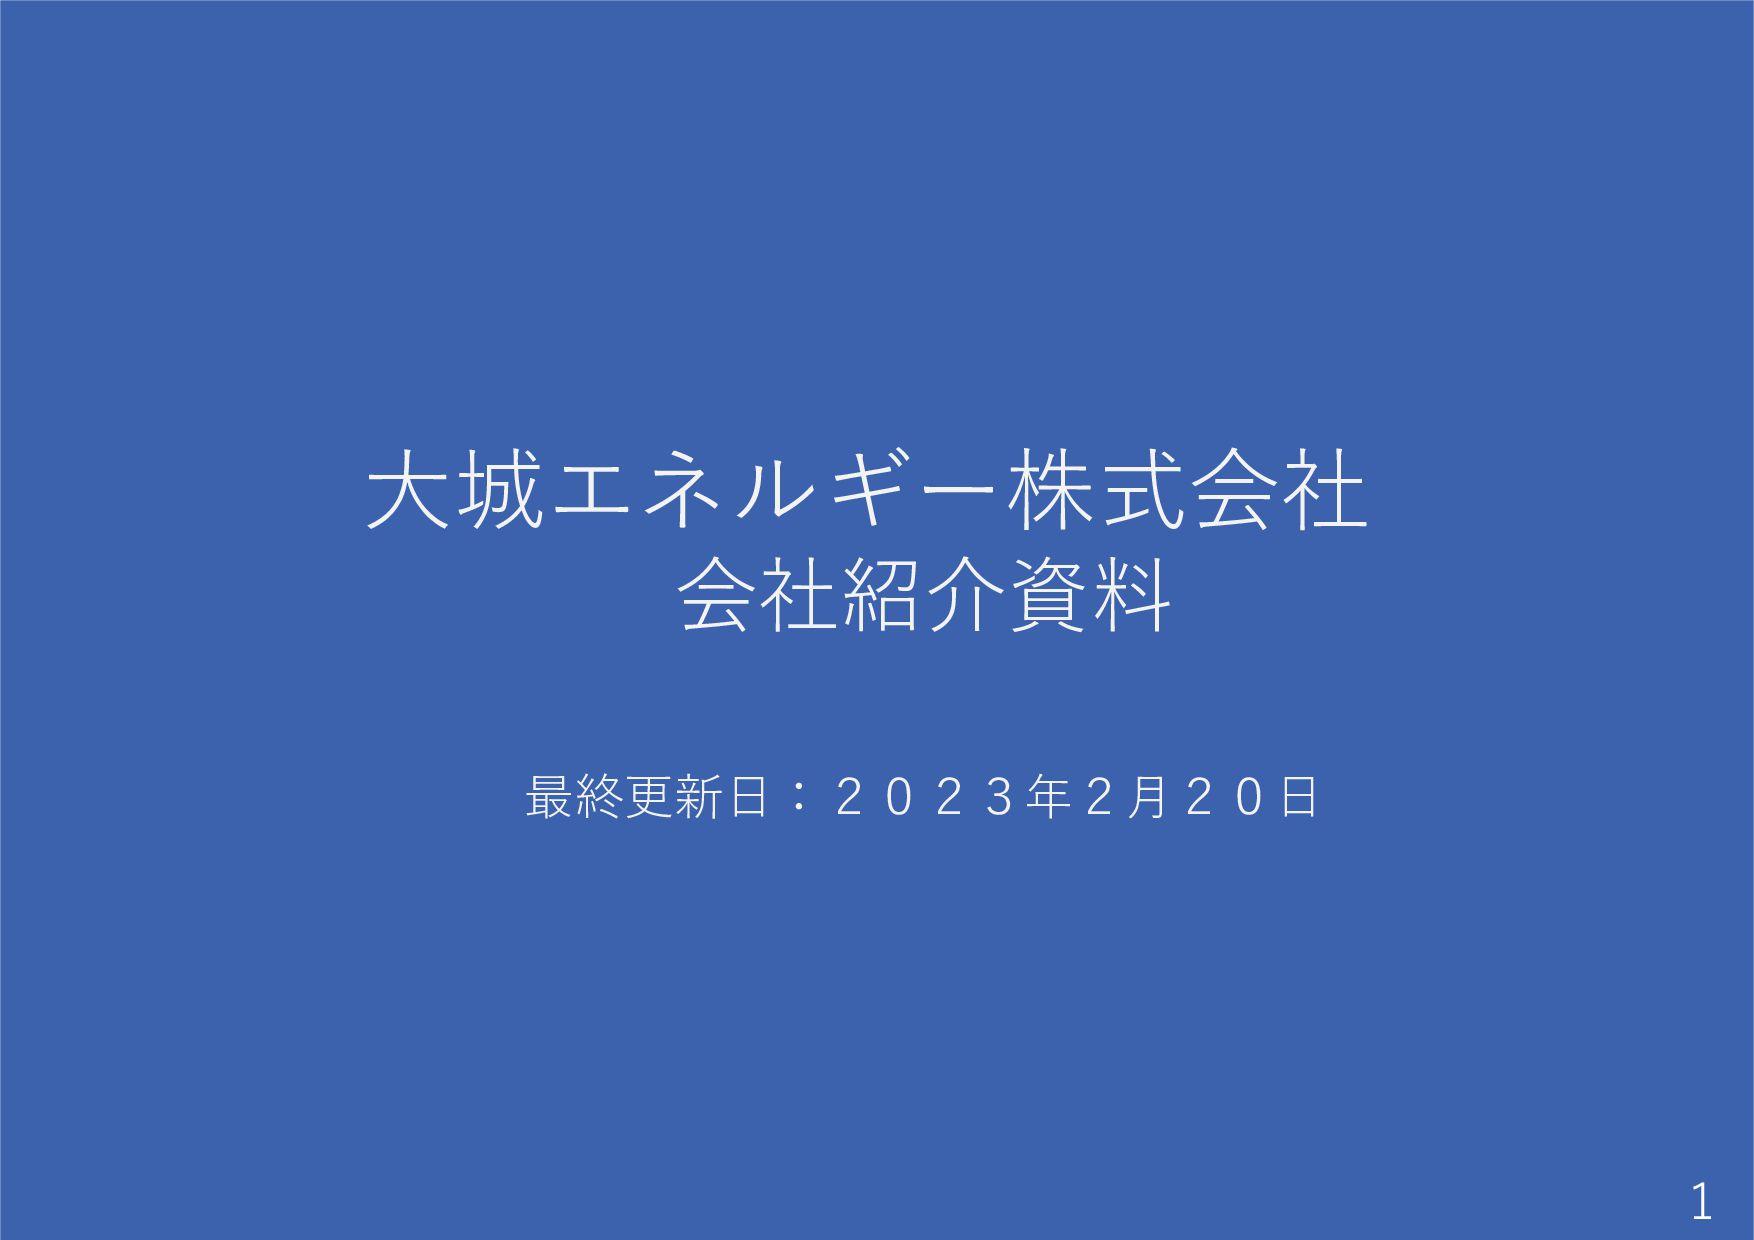 会社紹介資料 大城エネルギー株式会社 最終更新日:2021年8月20日